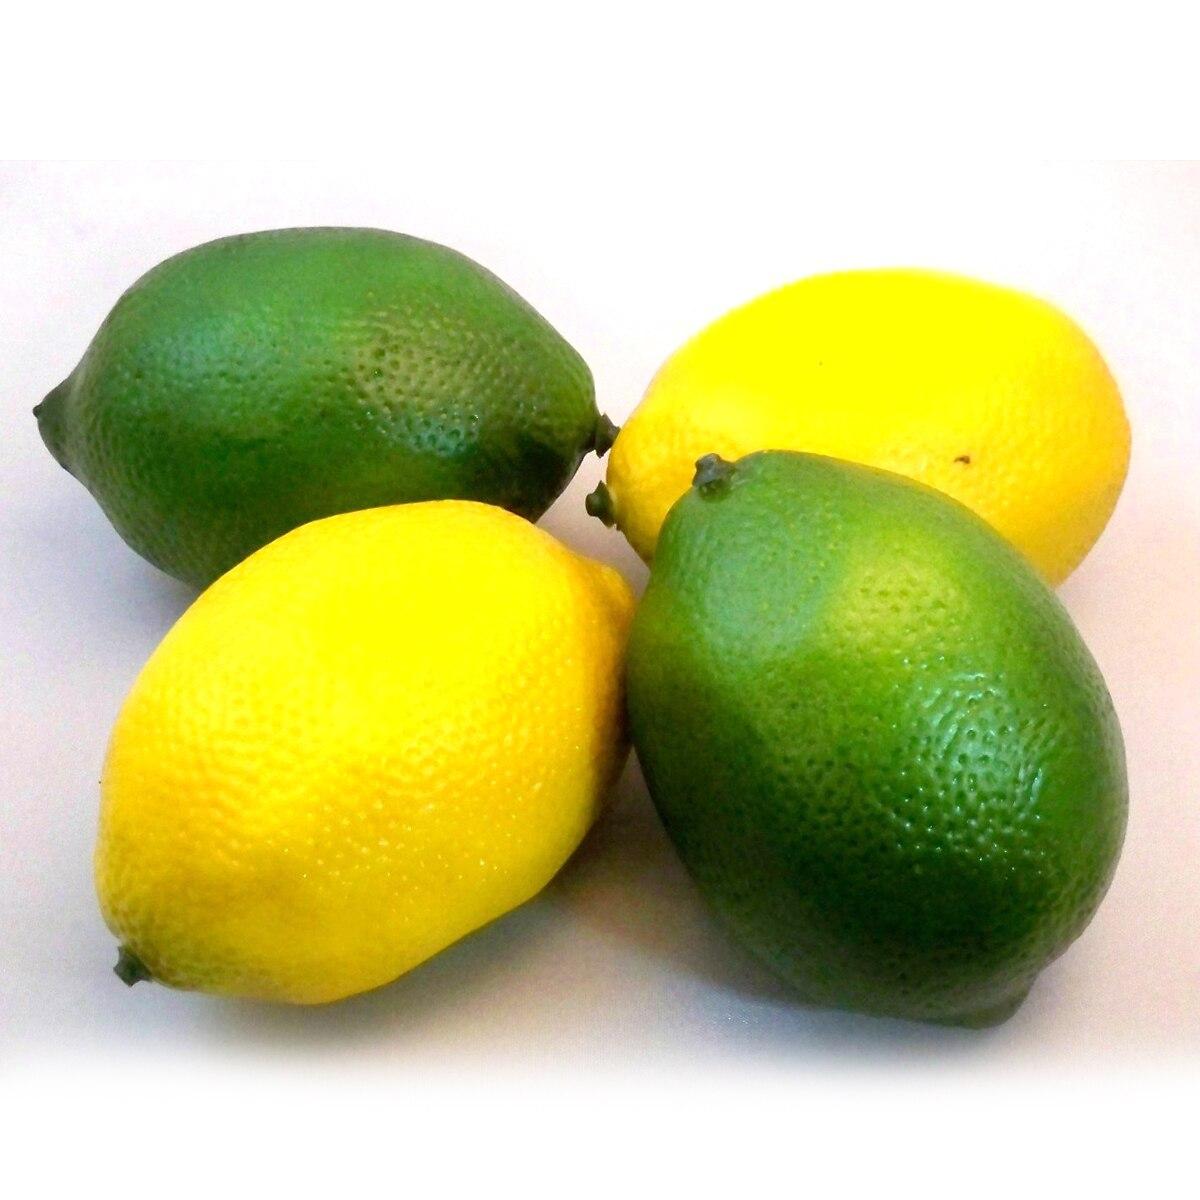 Artificial plants for kitchen - 2pcs Yellow 2pcs Green Artificial Fake Lemons Limes Fruit Kitchen Party Decorative Mold Beautiful Design